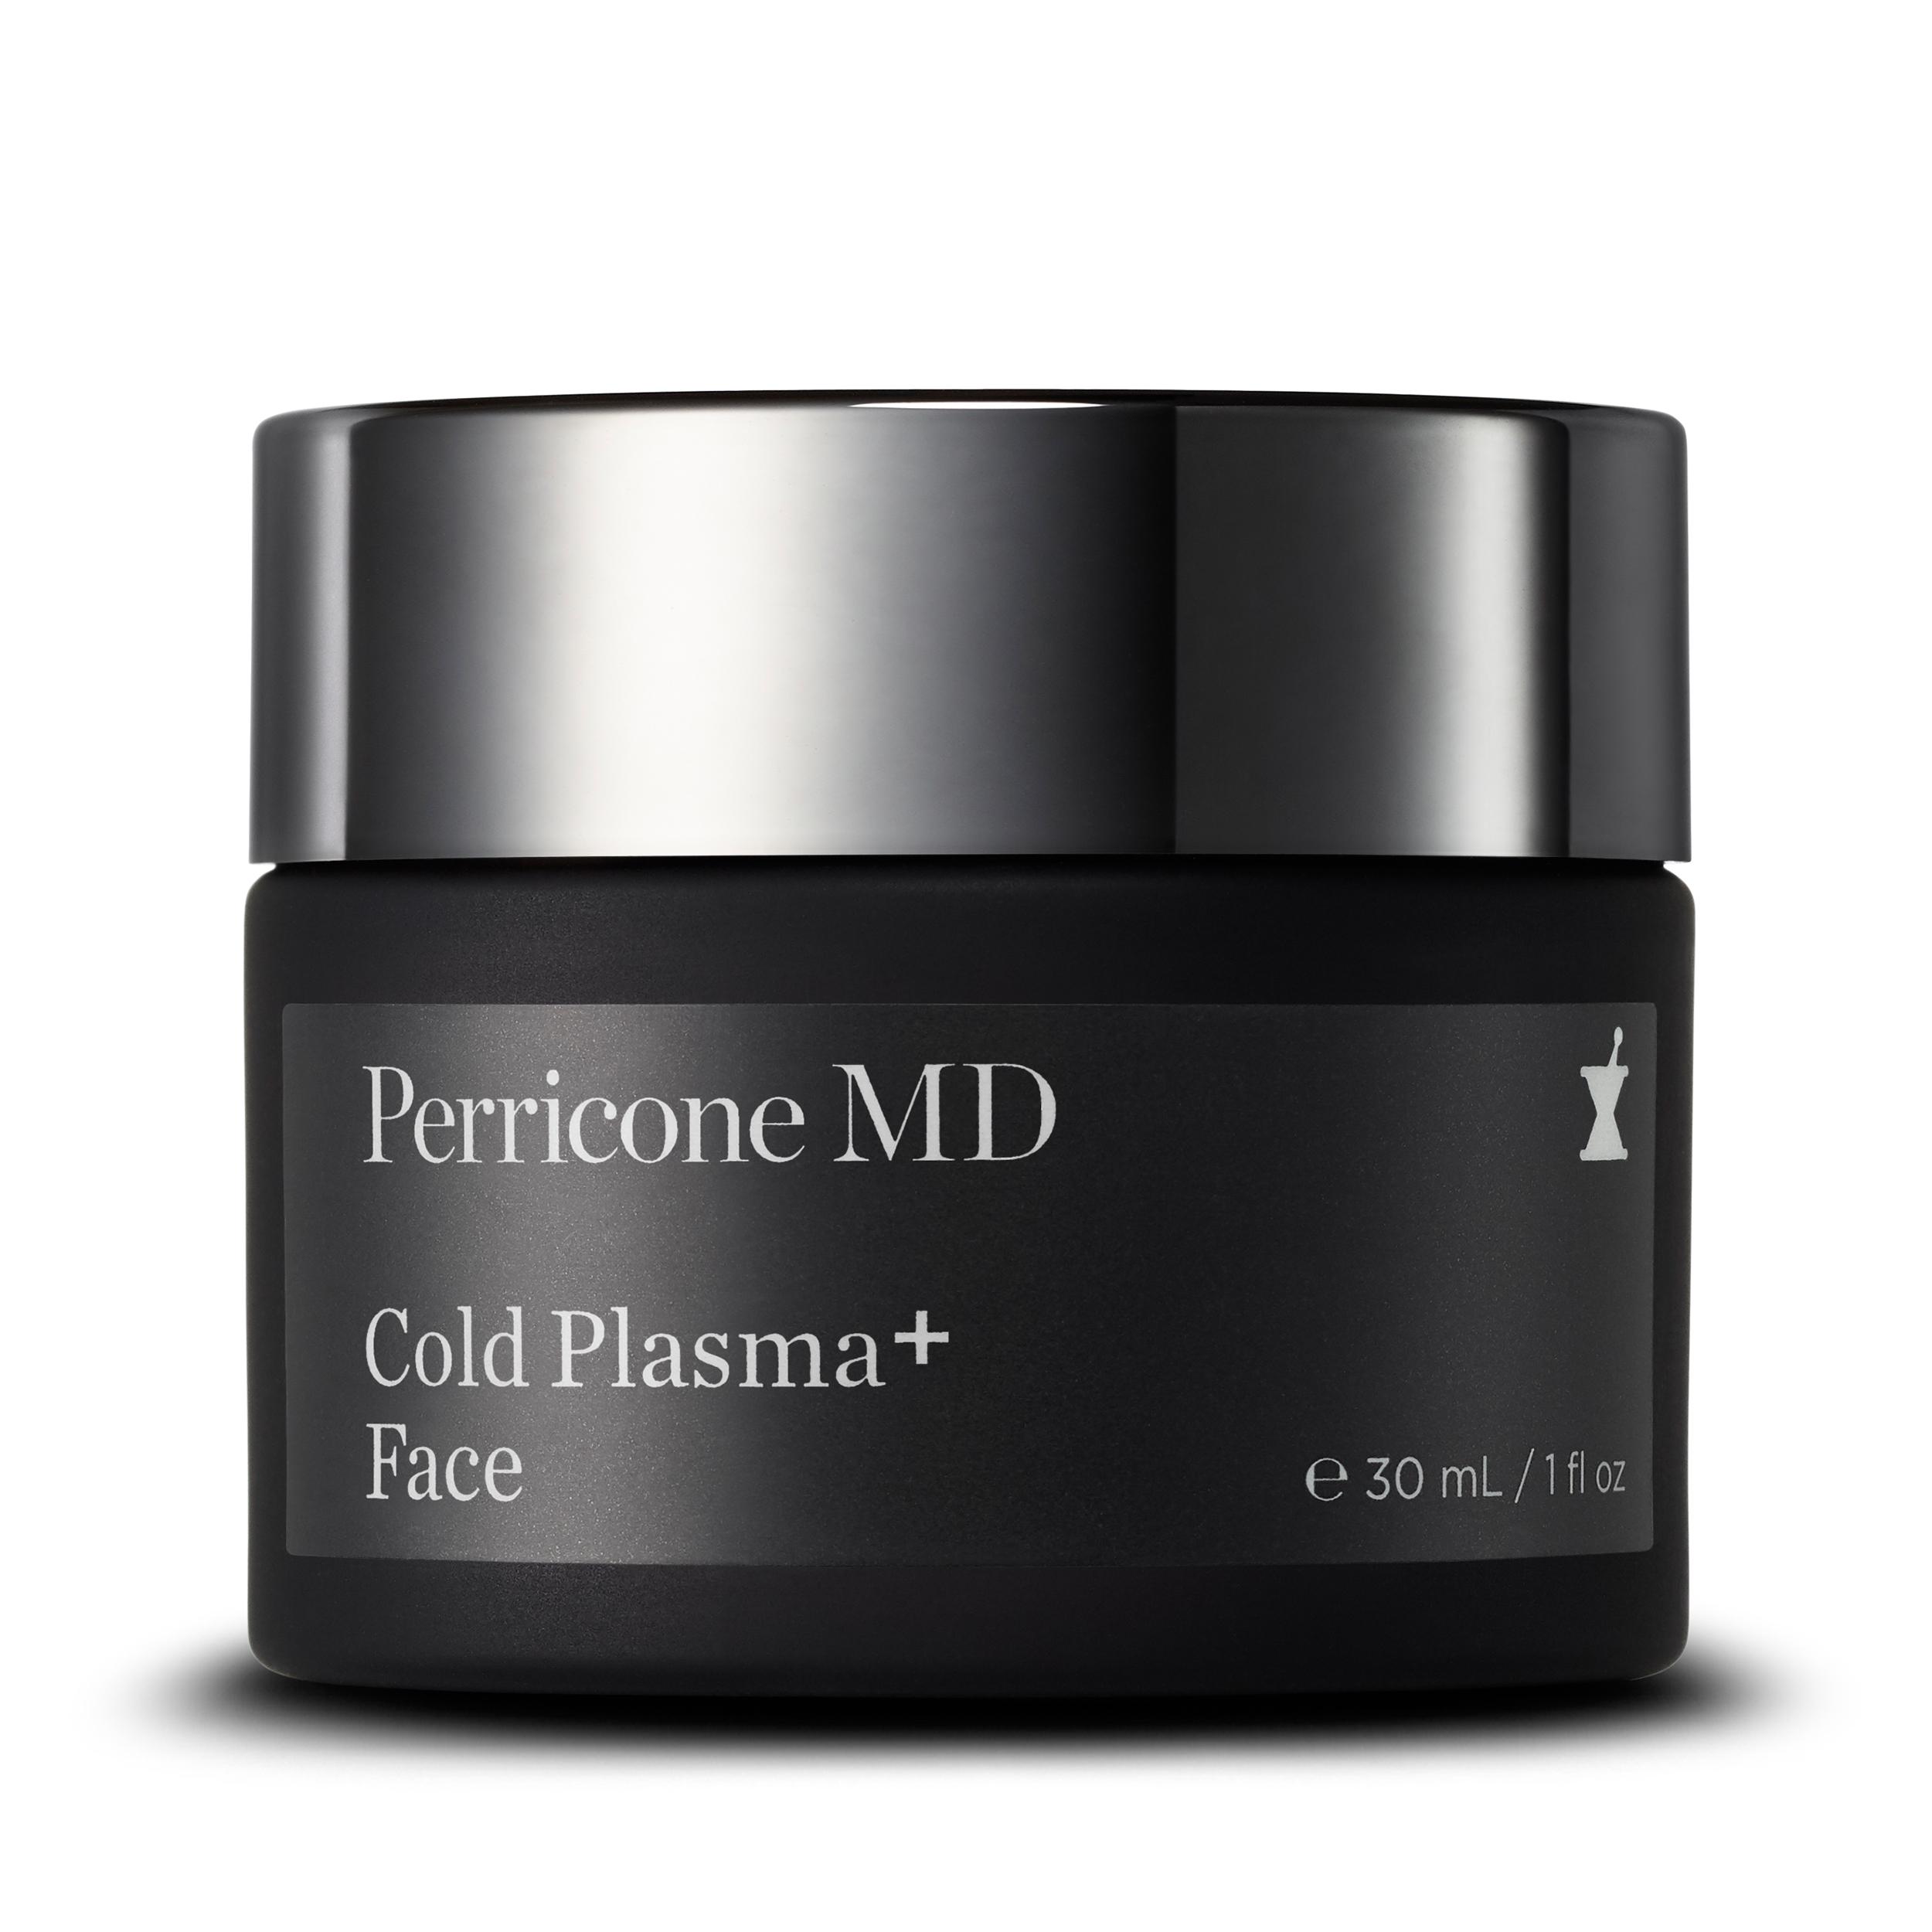 Купить Perricone MD Бустер для лица «Холодная плазма плюс» 30 мл